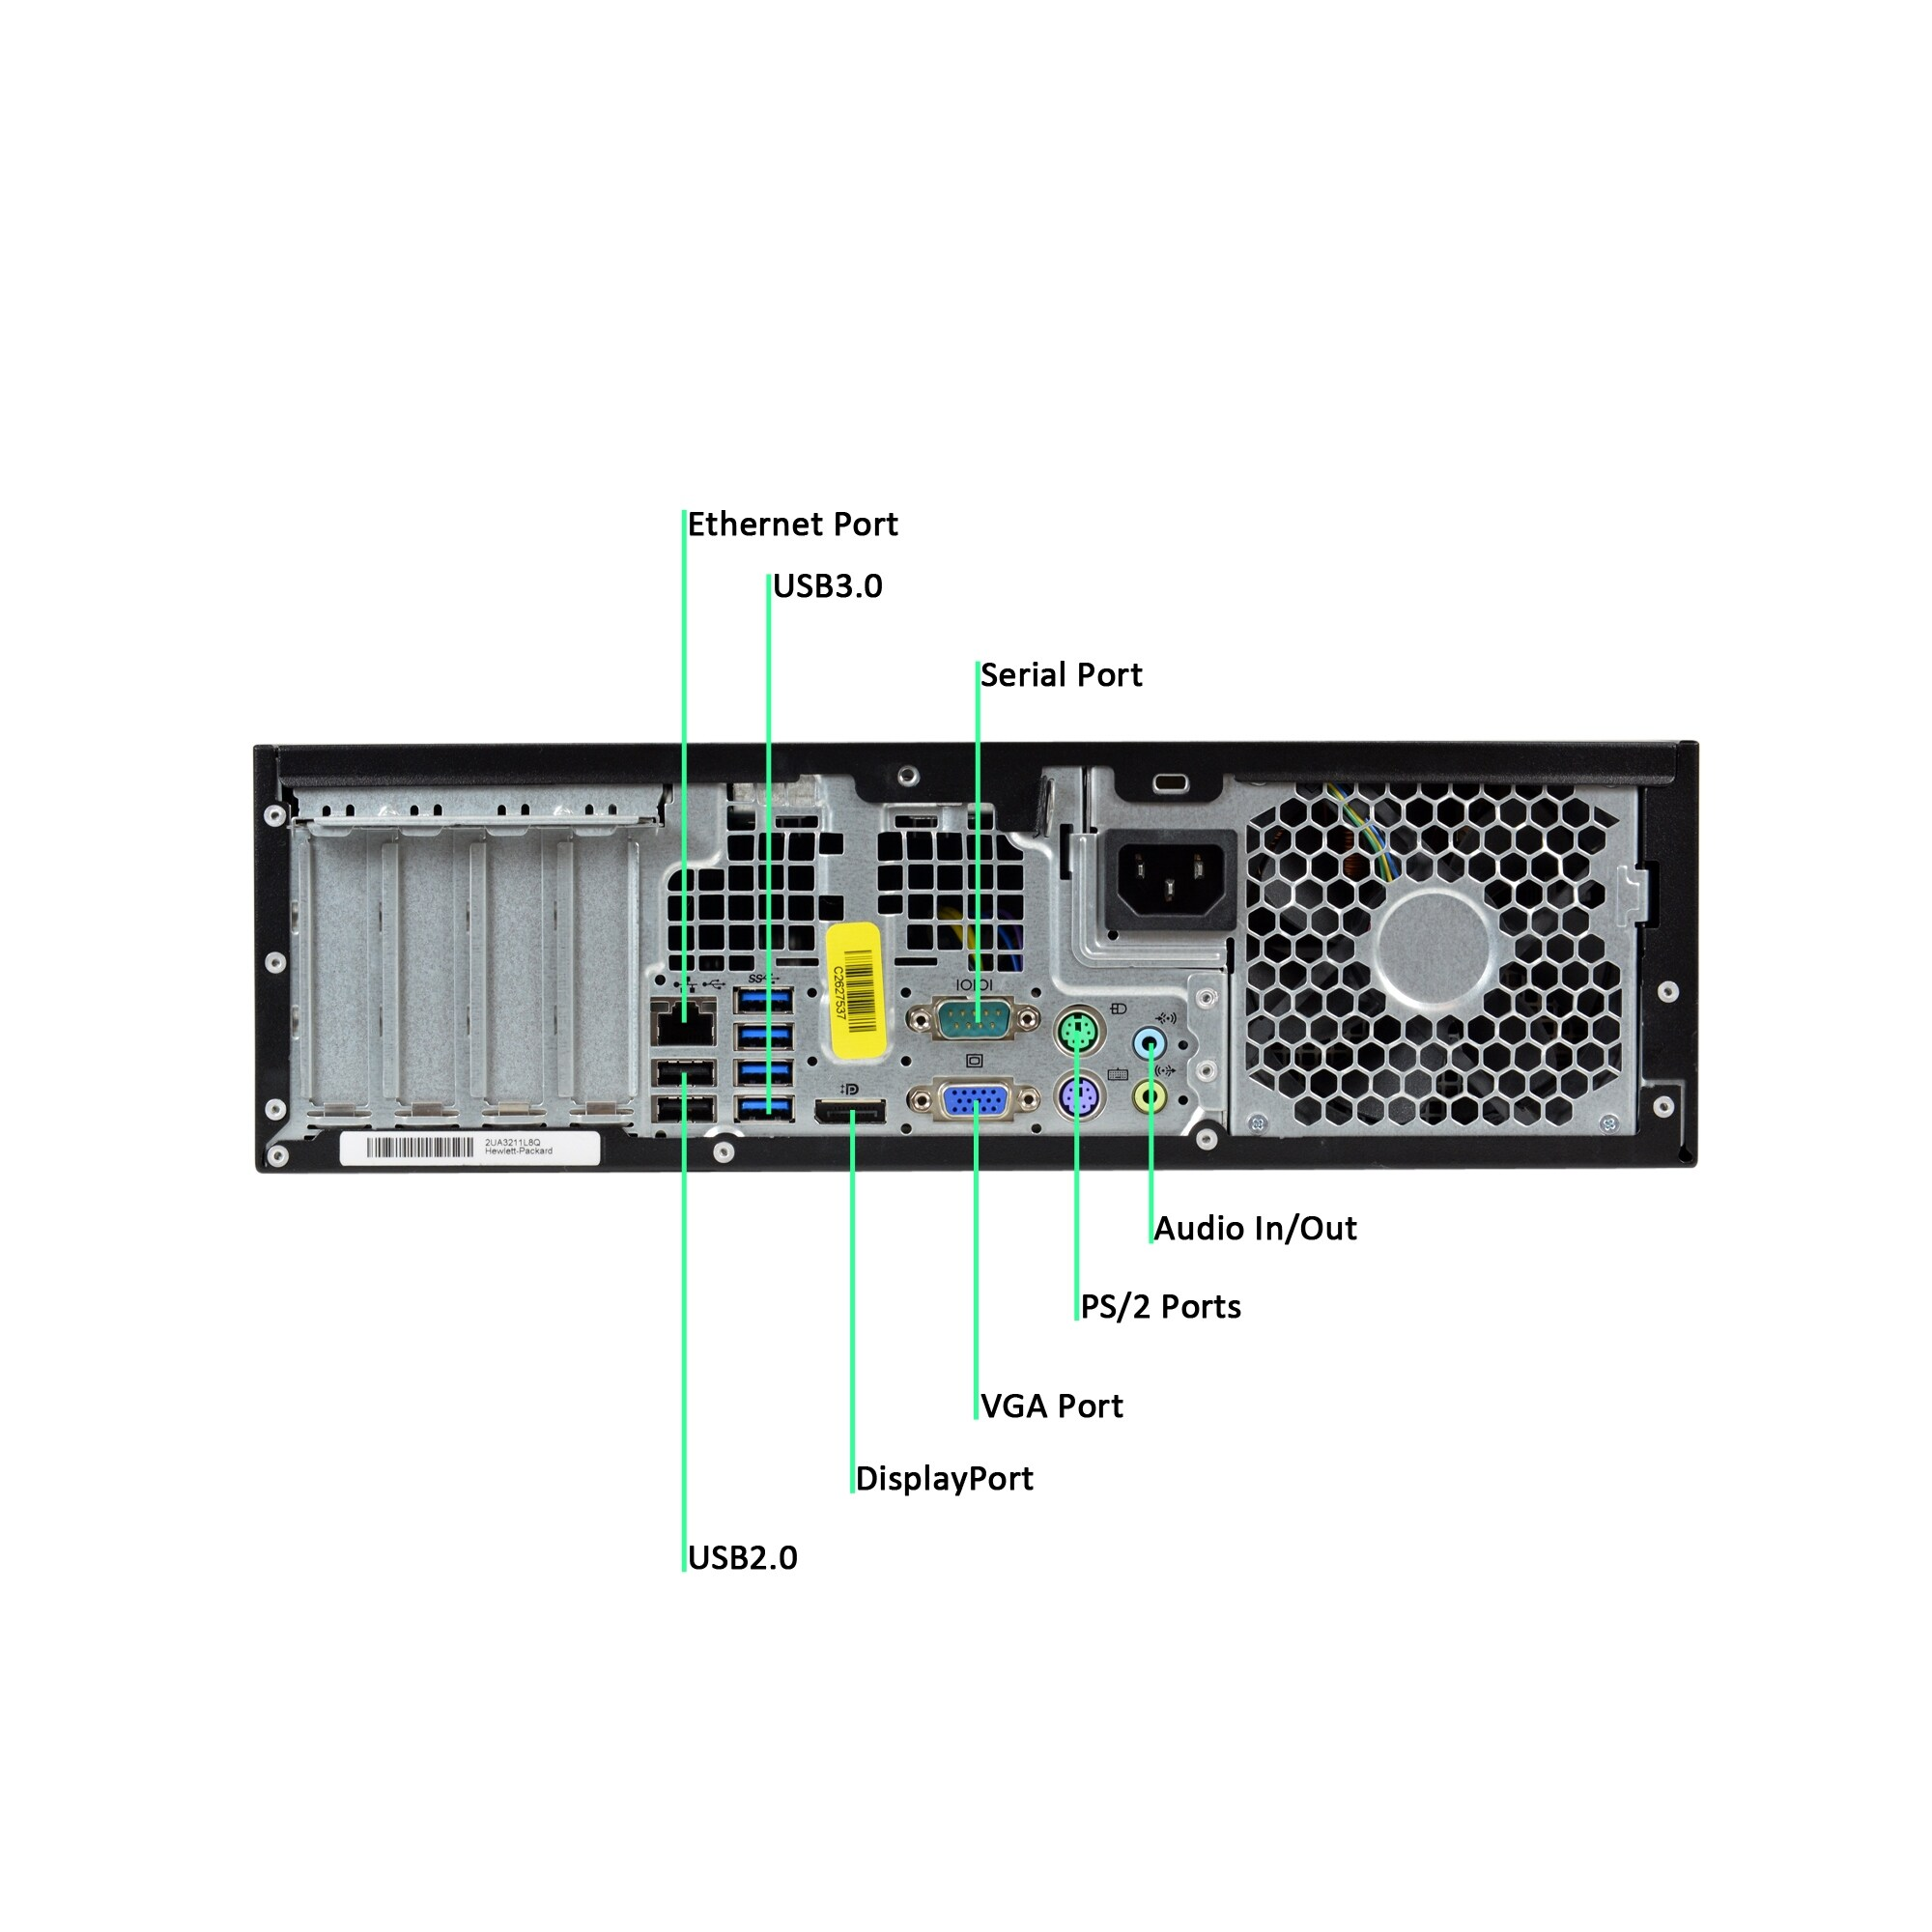 HP Z220-SFF Core i5-3470 3 2GHz 3rd Gen CPU 8GB RAM 500GB HDD Windows 10  Pro Computer (Refurbished)